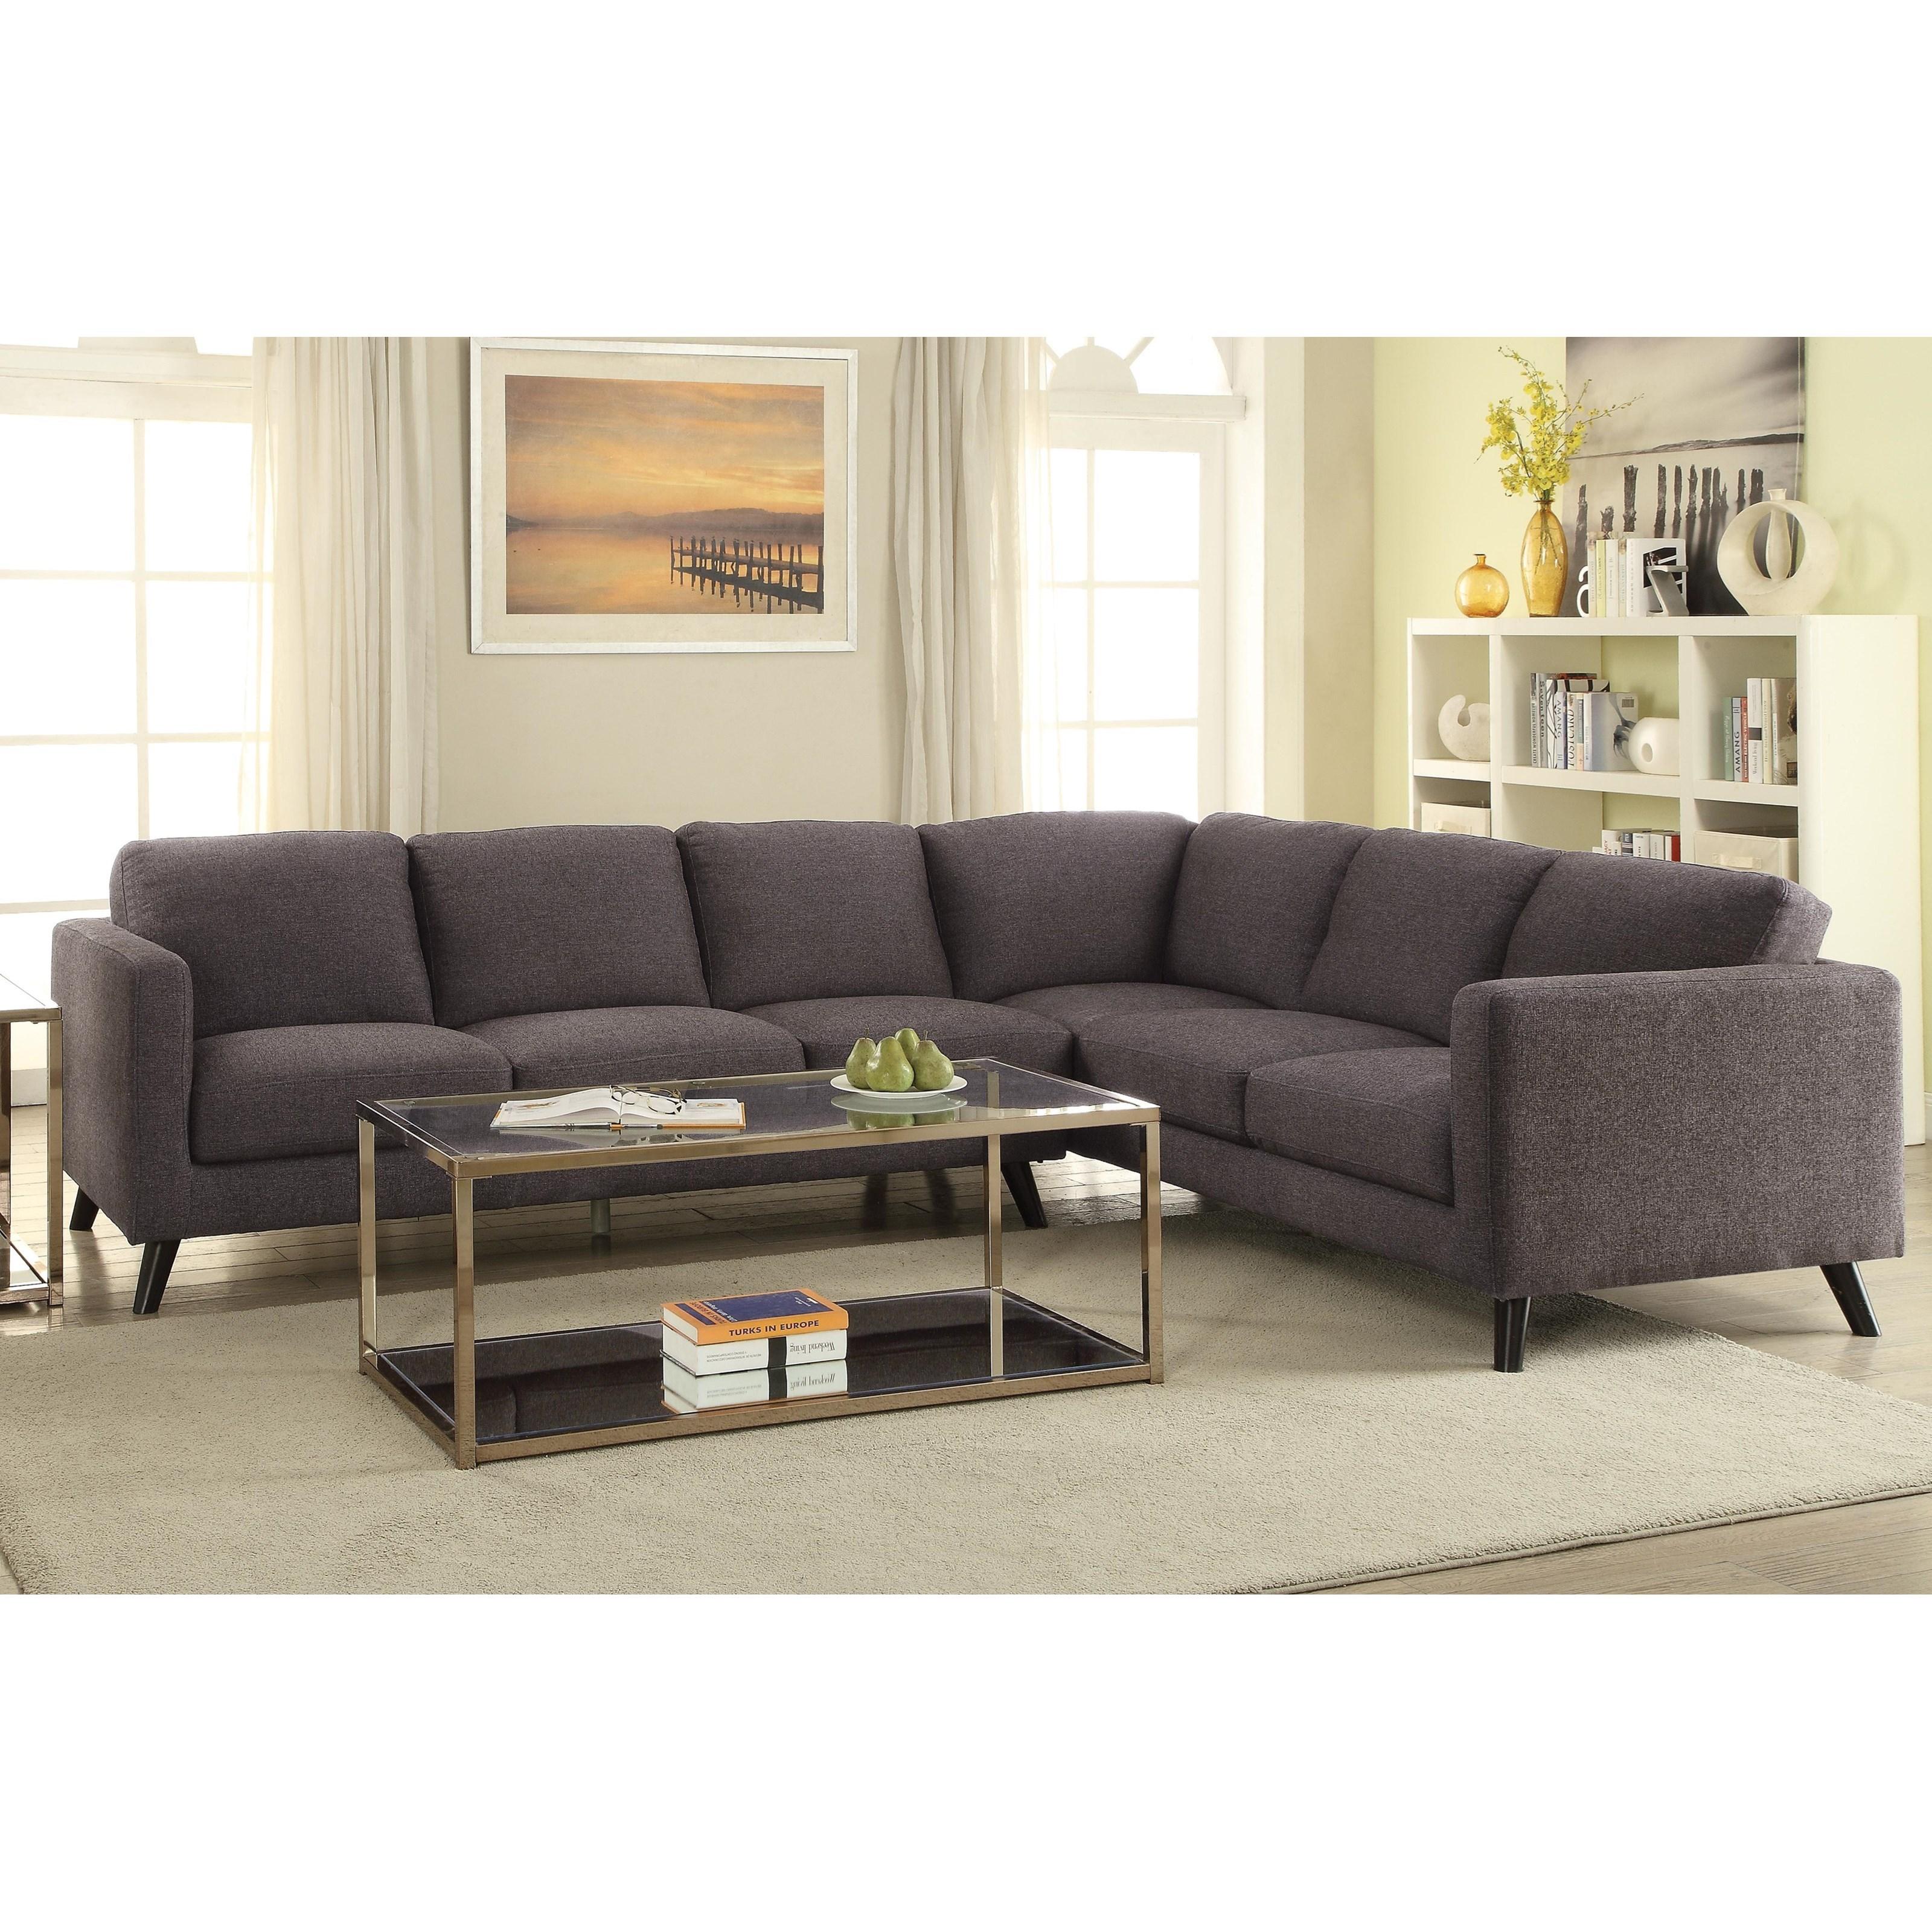 Lovely Coaster Azalea Mid Century Modern Sectional   Pedigo Furniture   Sectional  Sofas